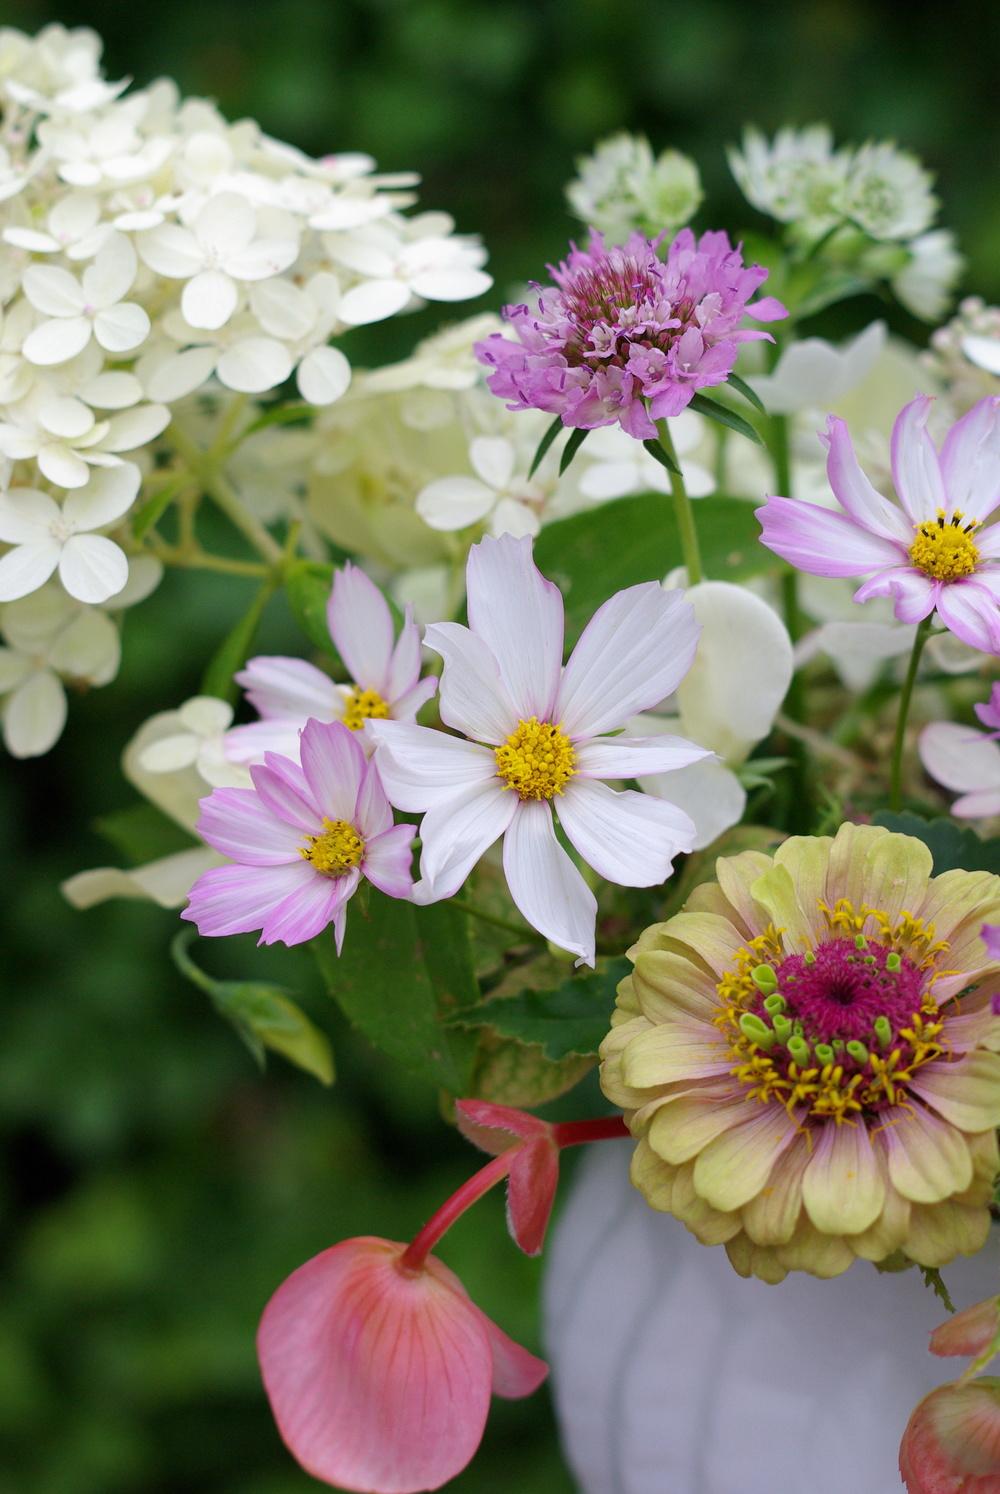 Late August - begonias, zinnia, epimedium foliage, cosmos, scabiosa, 'Limelight' hydrangea, astrantia, sweet peas